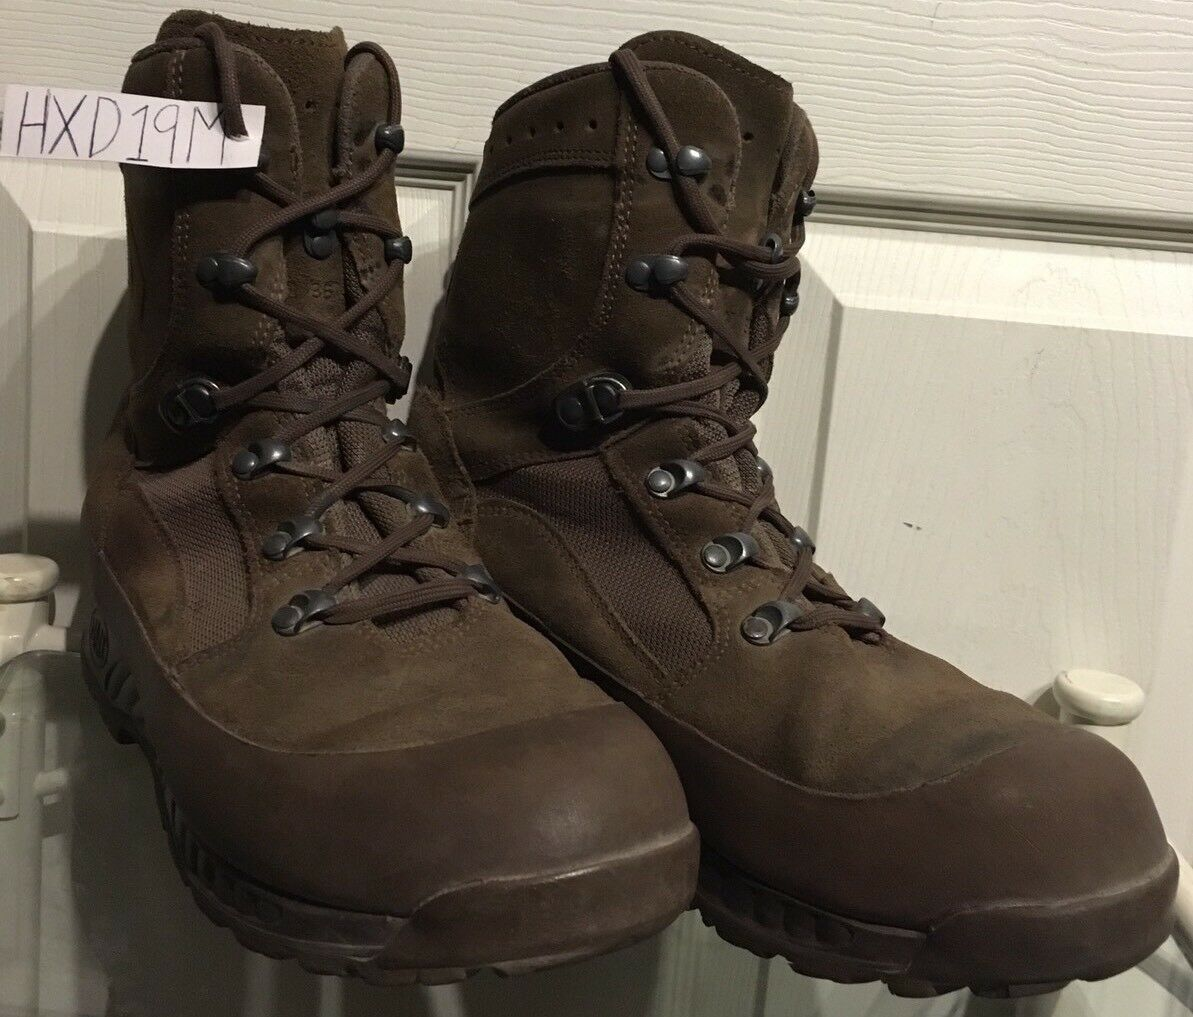 Haix Deserto Marrone in Pelle Scamosciata MTP British HXD19M Army Issue ANFIBI 9M HXD19M British 01f9c9